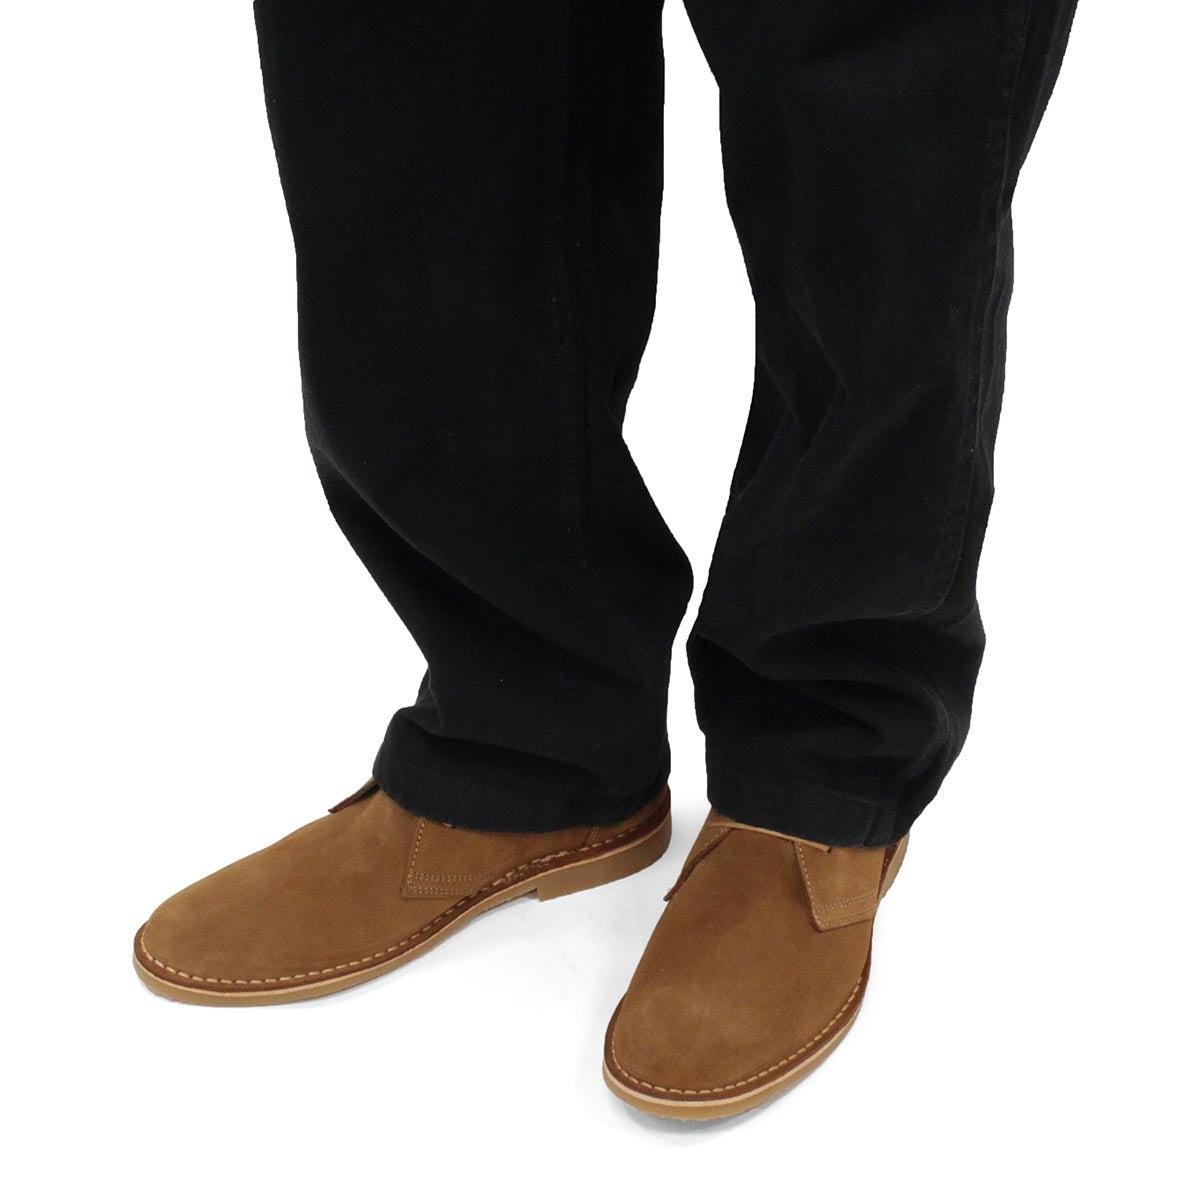 Men's Cesare Chukka boot - Cognac